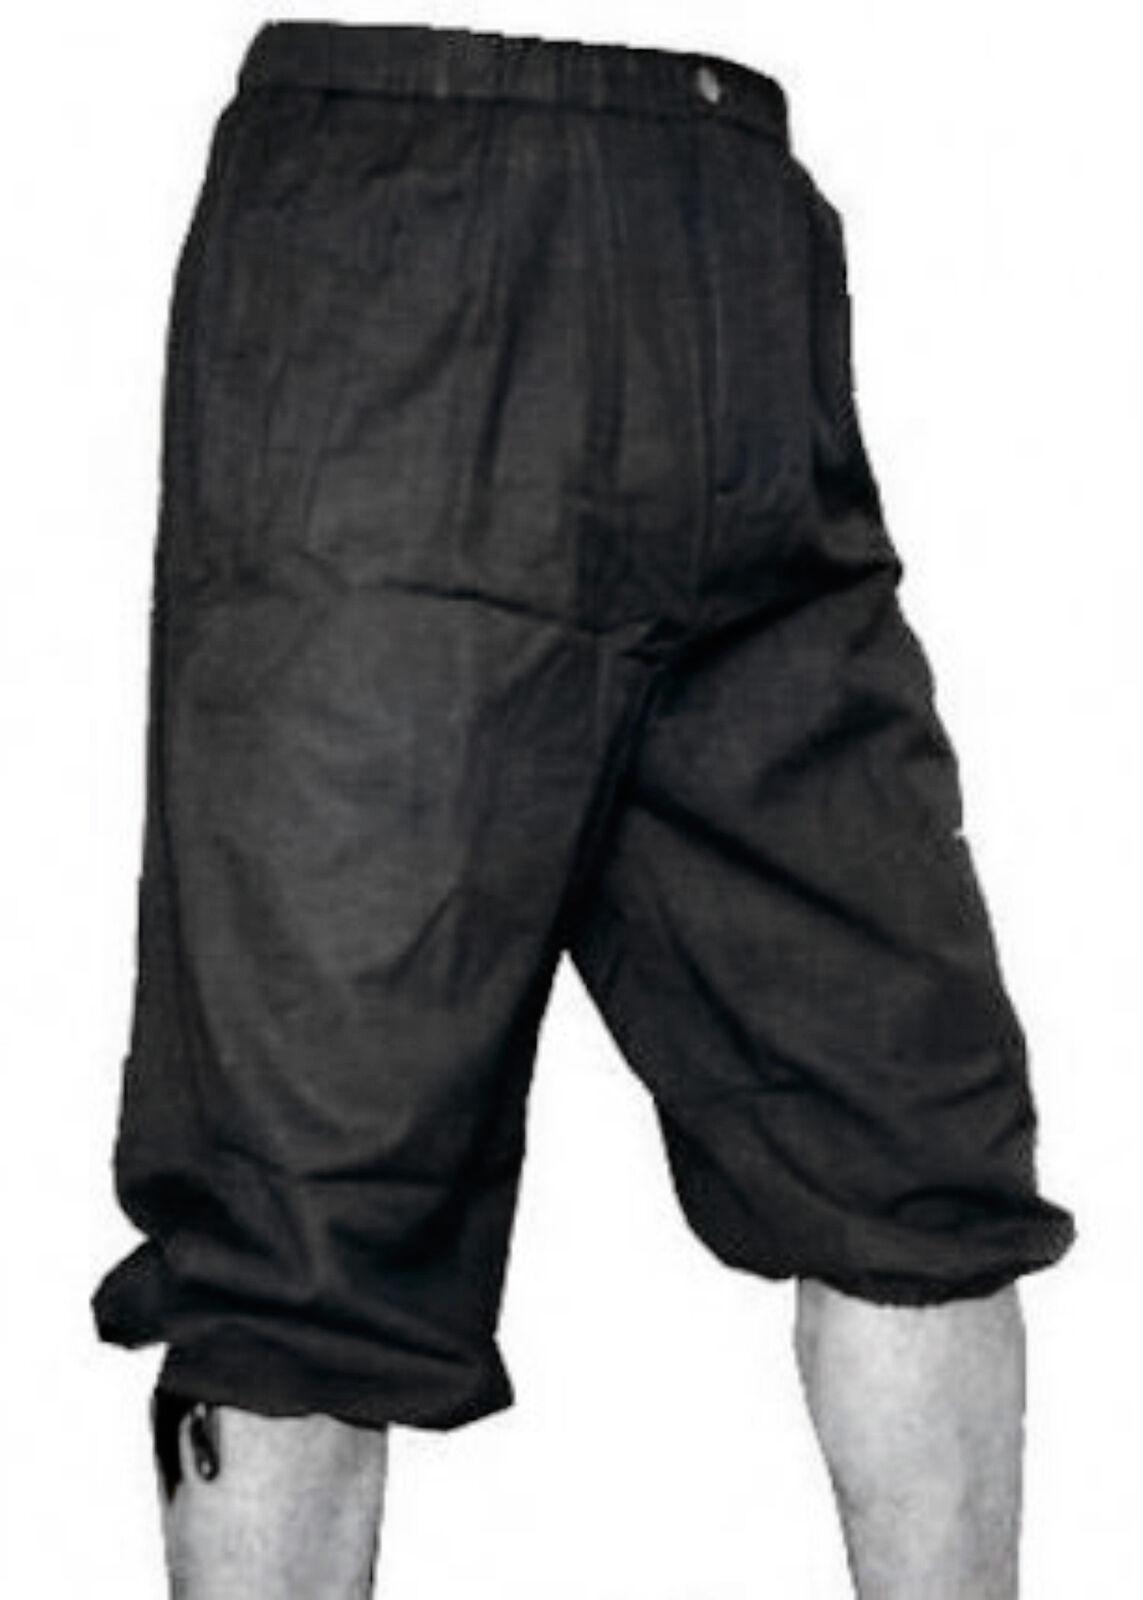 Knickerbockers, black, Medieval LARP Pants Trousers Shorts Garment Costume